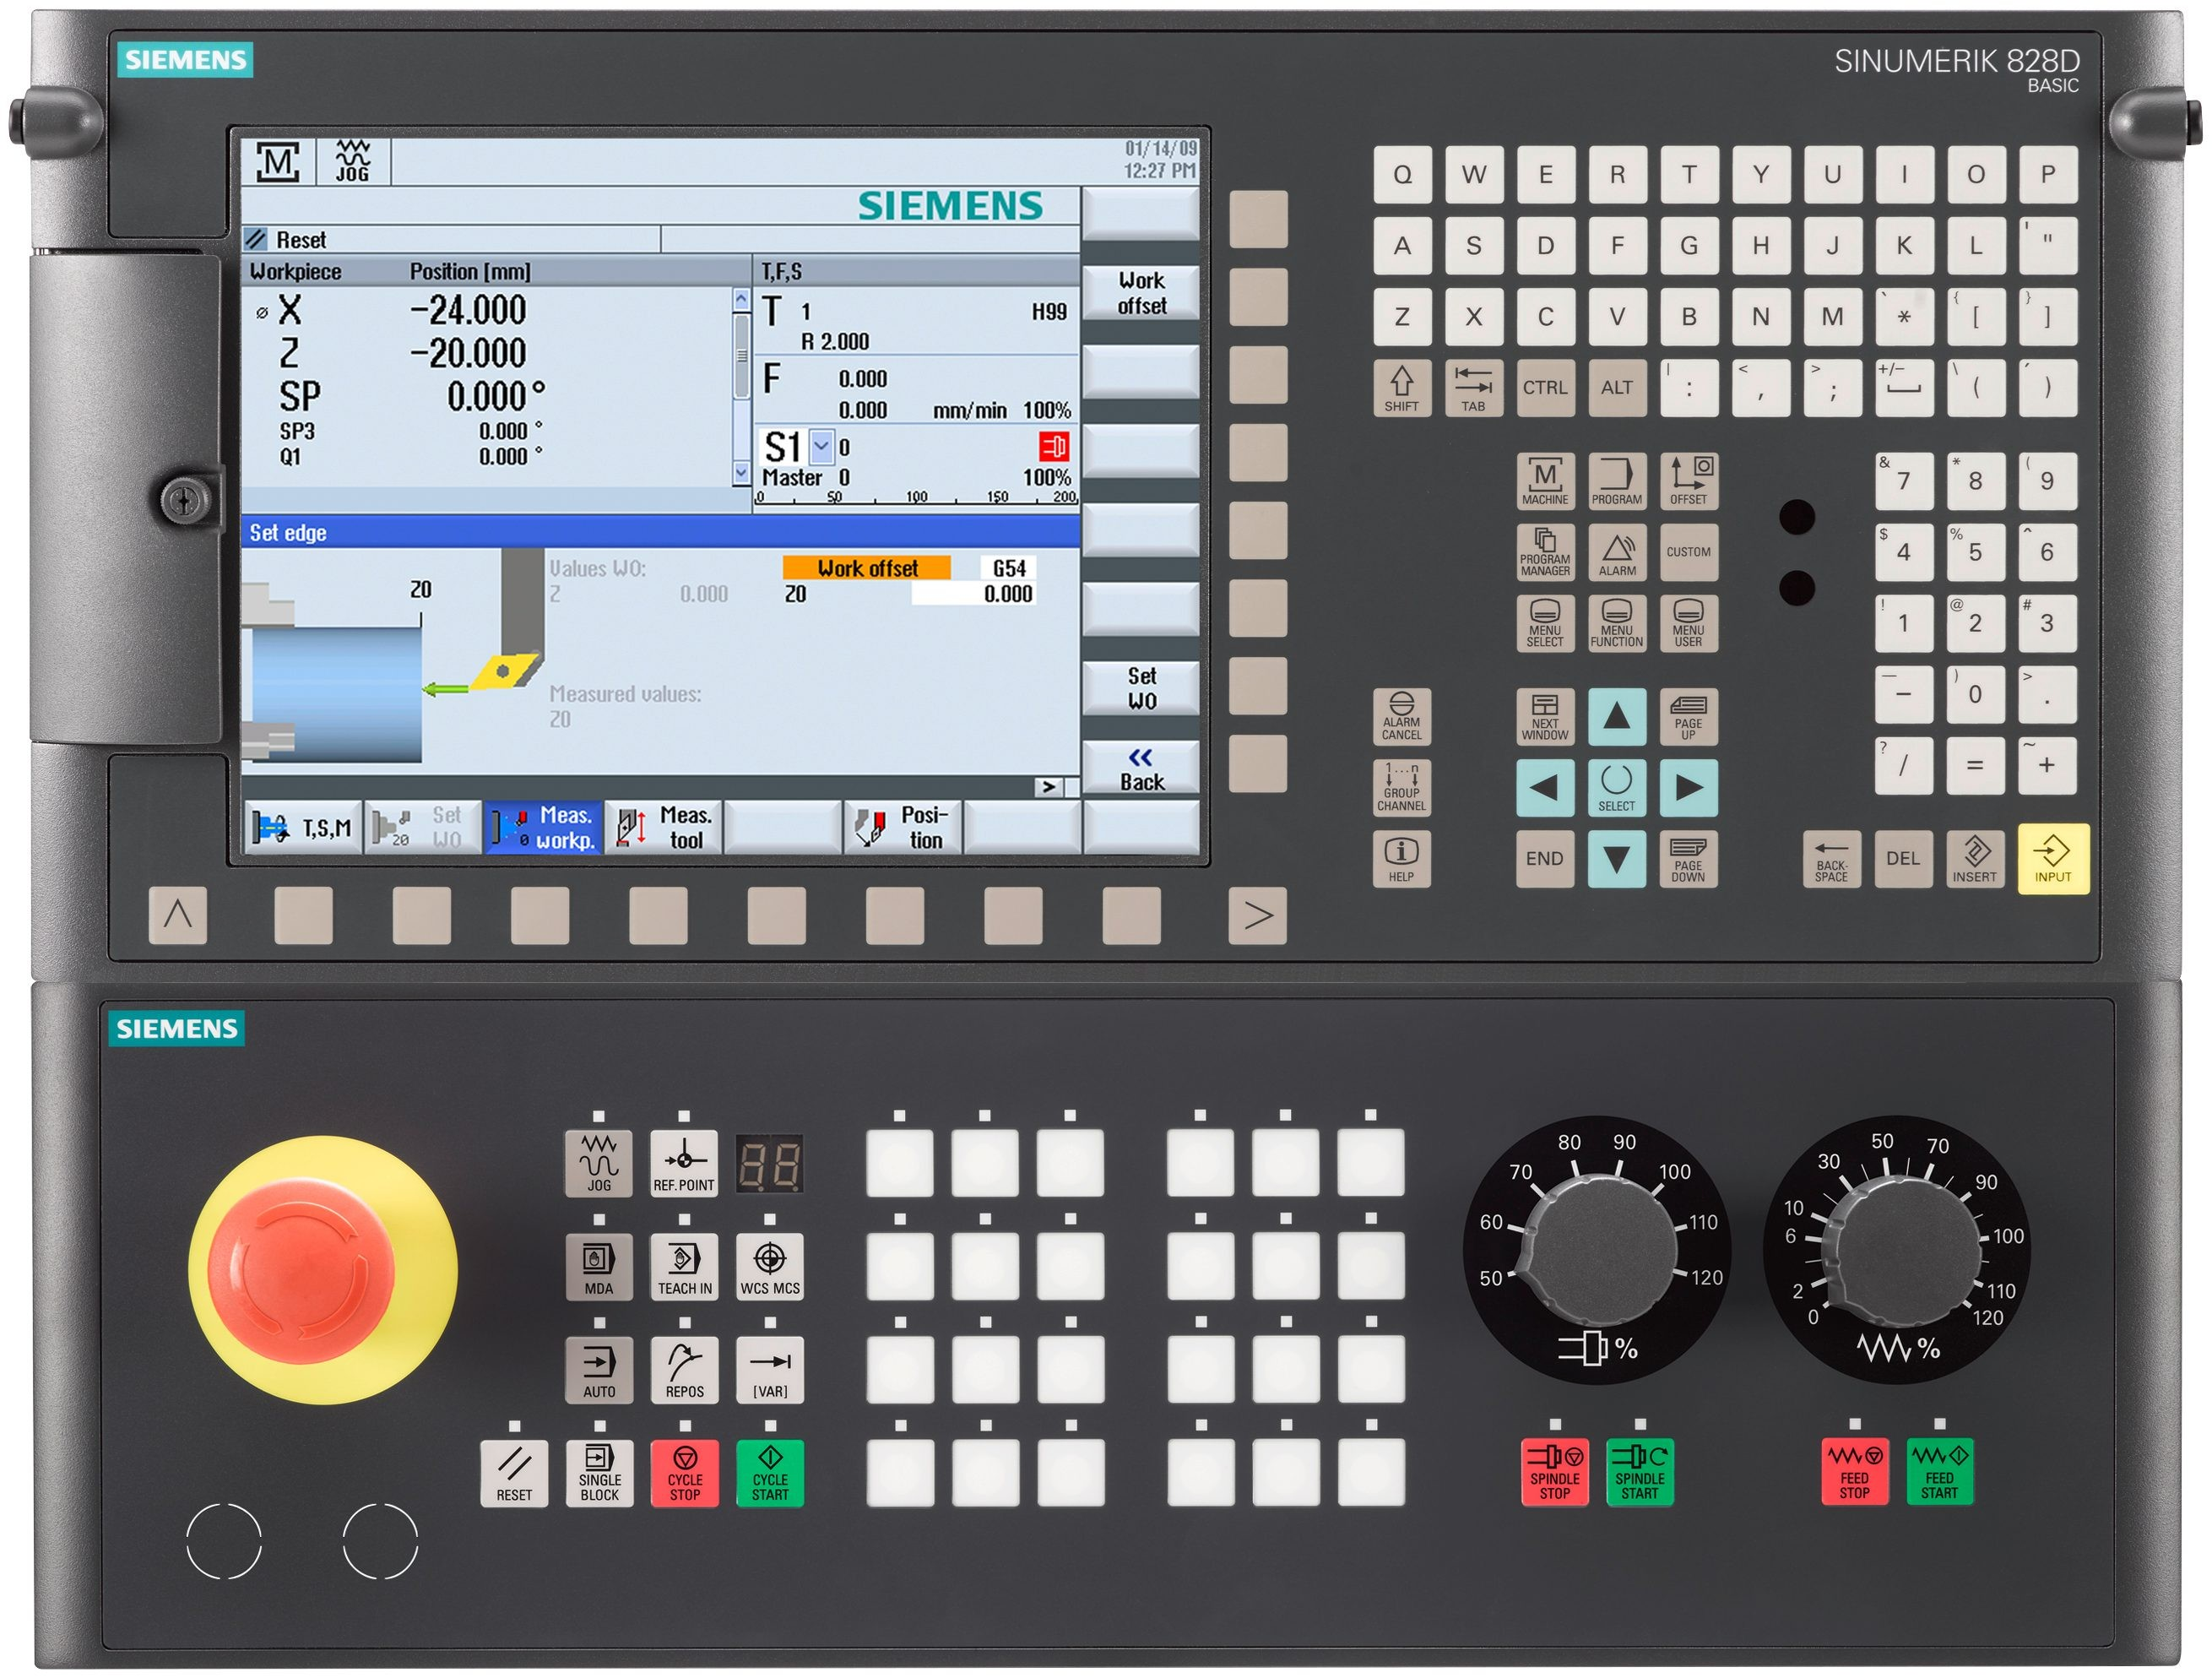 SIEMENS 828D Controller for CNC ROUTER MACHINE